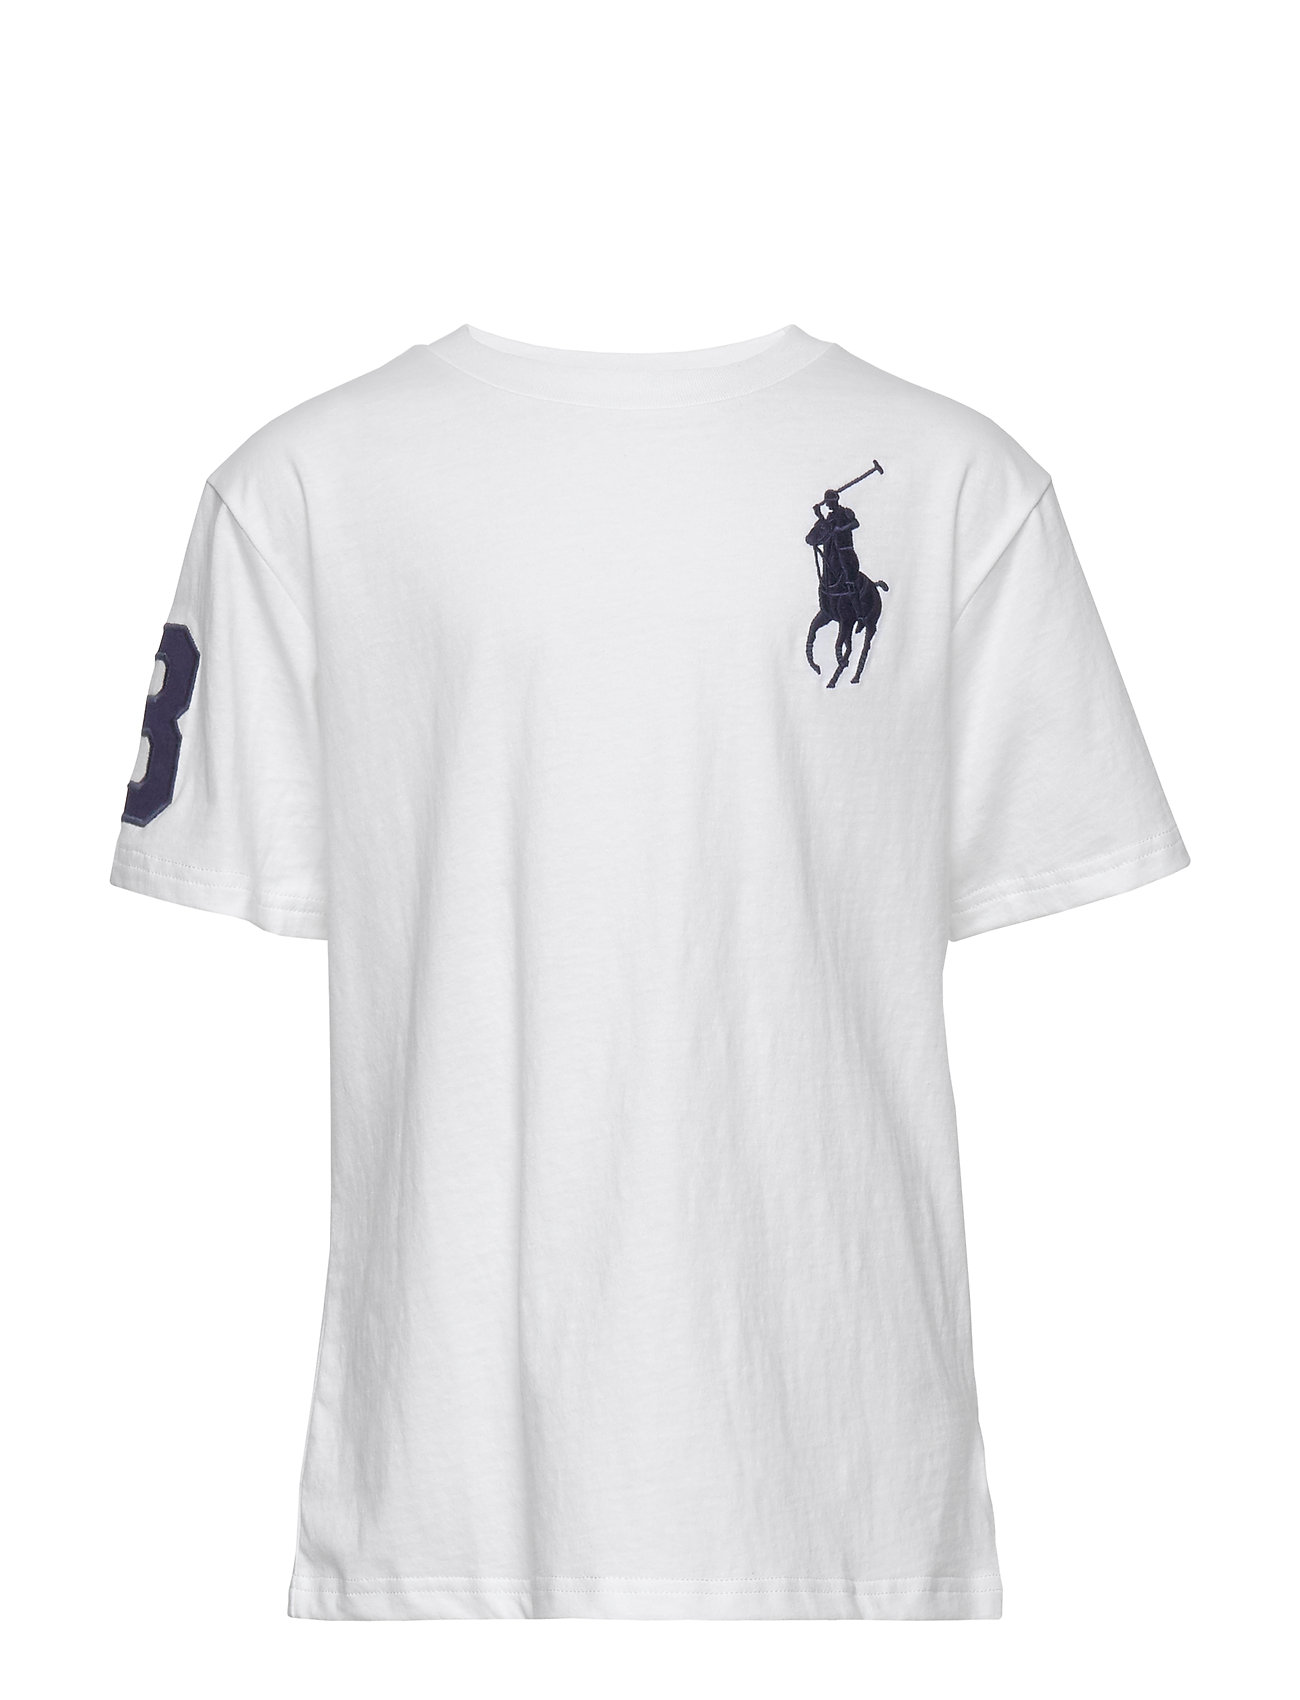 Ralph Lauren Kids Big Pony Cotton Jersey Tee - WHITE